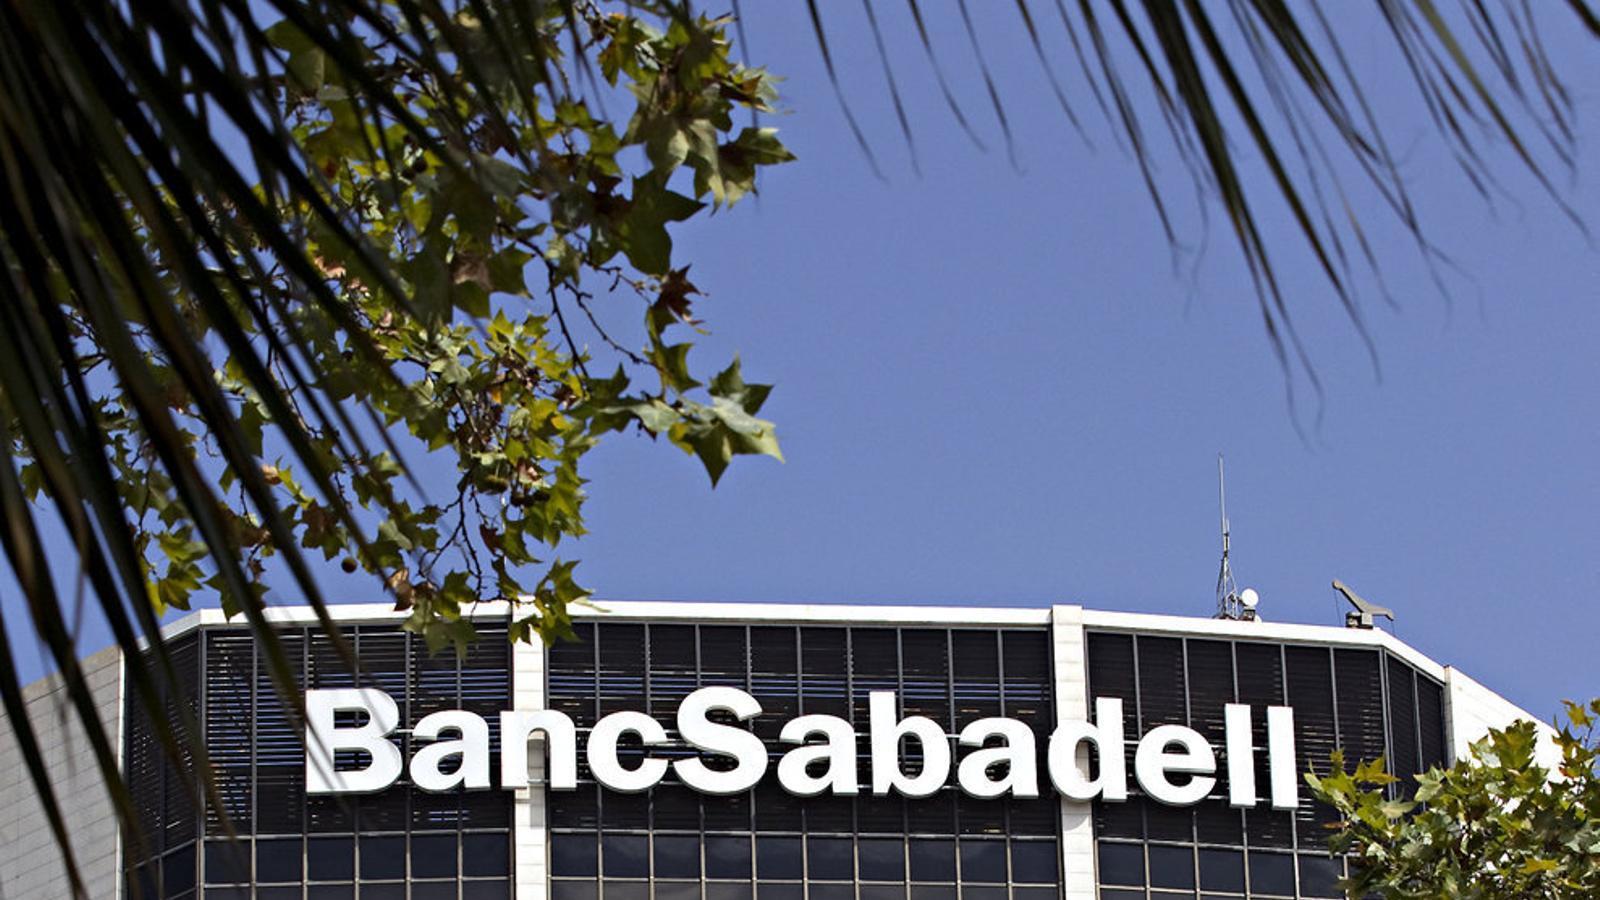 El Sabadell es vol desfer del totxo i obre el procés de venda de Solvia Desarrollos Inmobiliarios